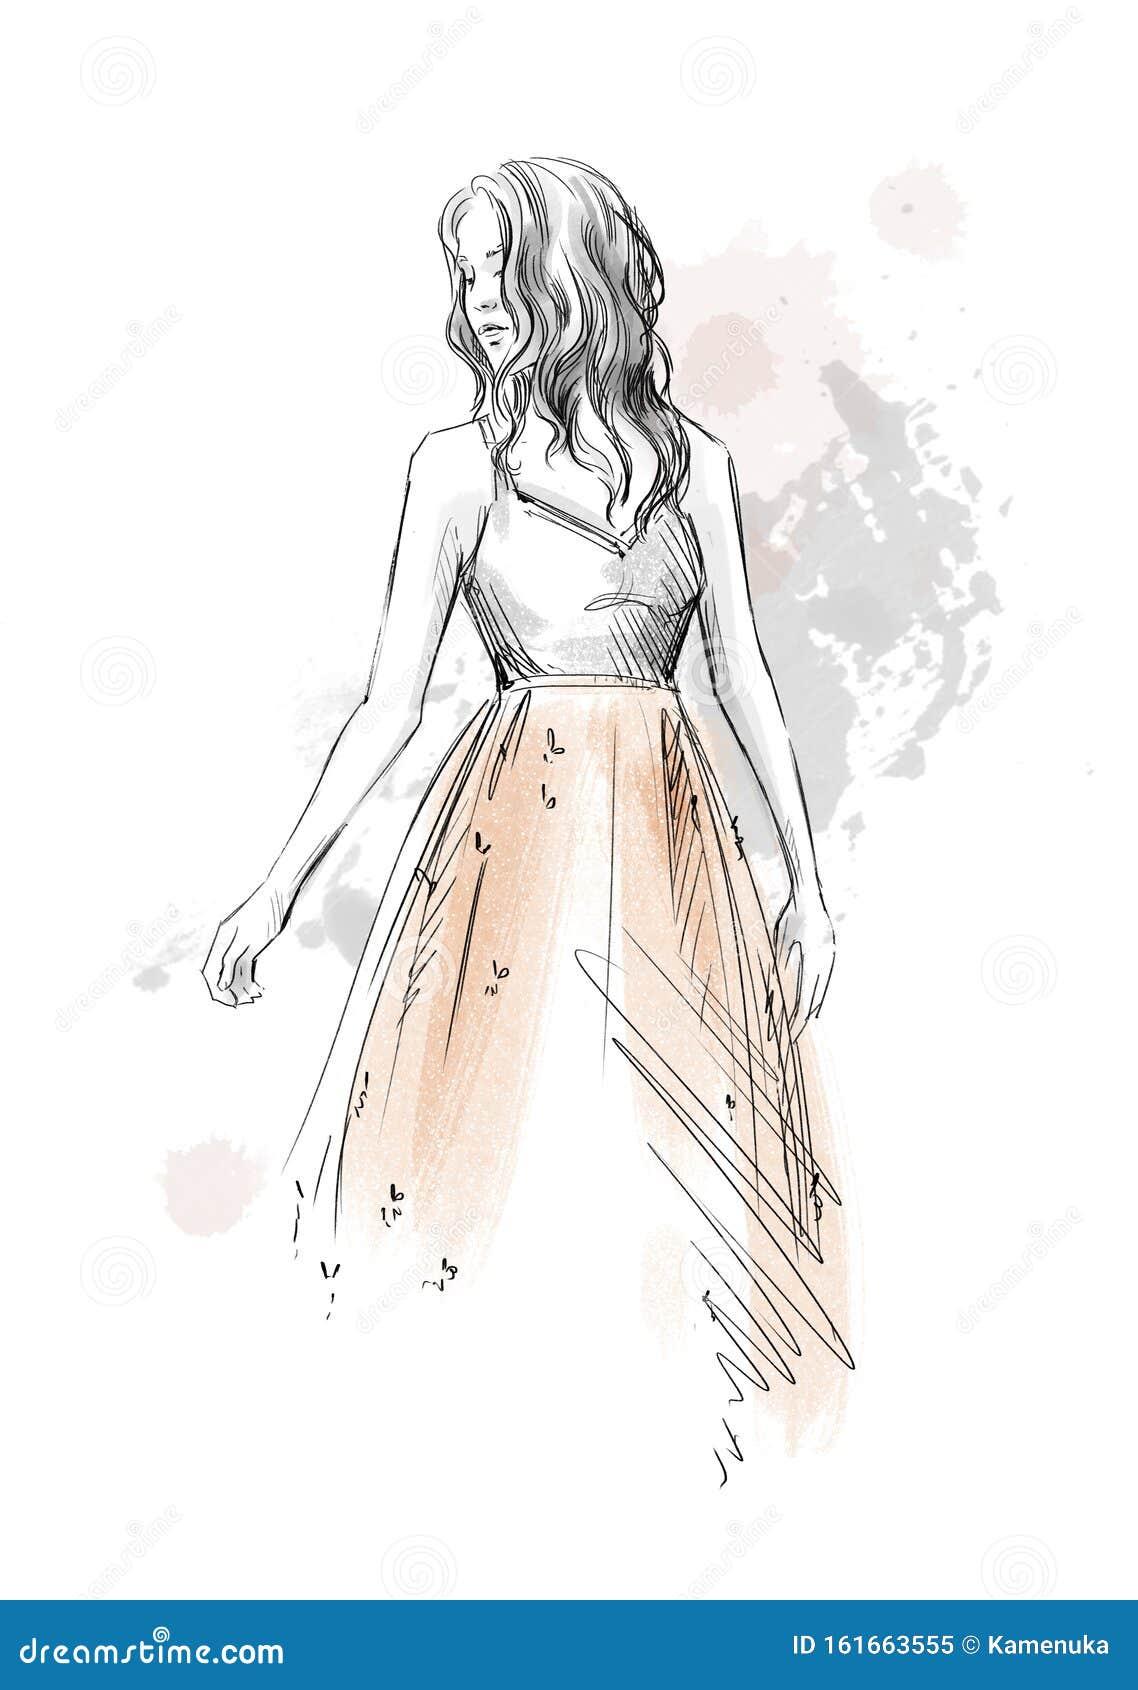 Fashion Illustration Girl In A Romantic Dress Pencil Sketch Stock Illustration Illustration Of Female Decoration 161663555